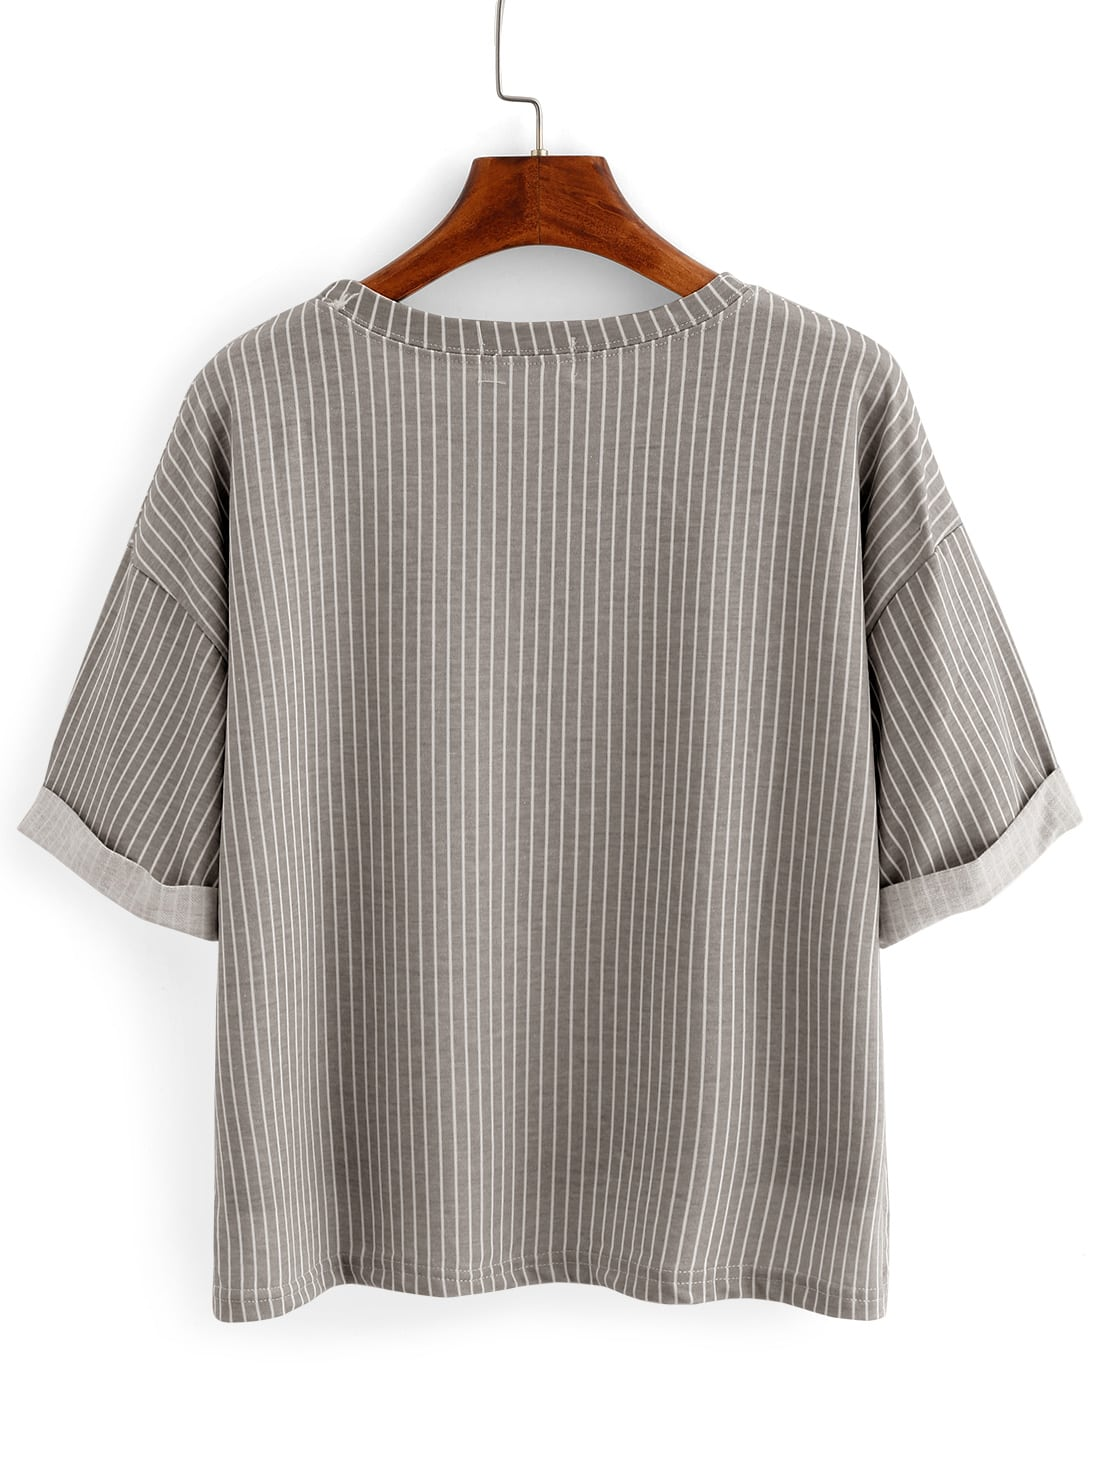 Vertical Striped High-Low Pocket T-shirt - Grey -SheIn ...